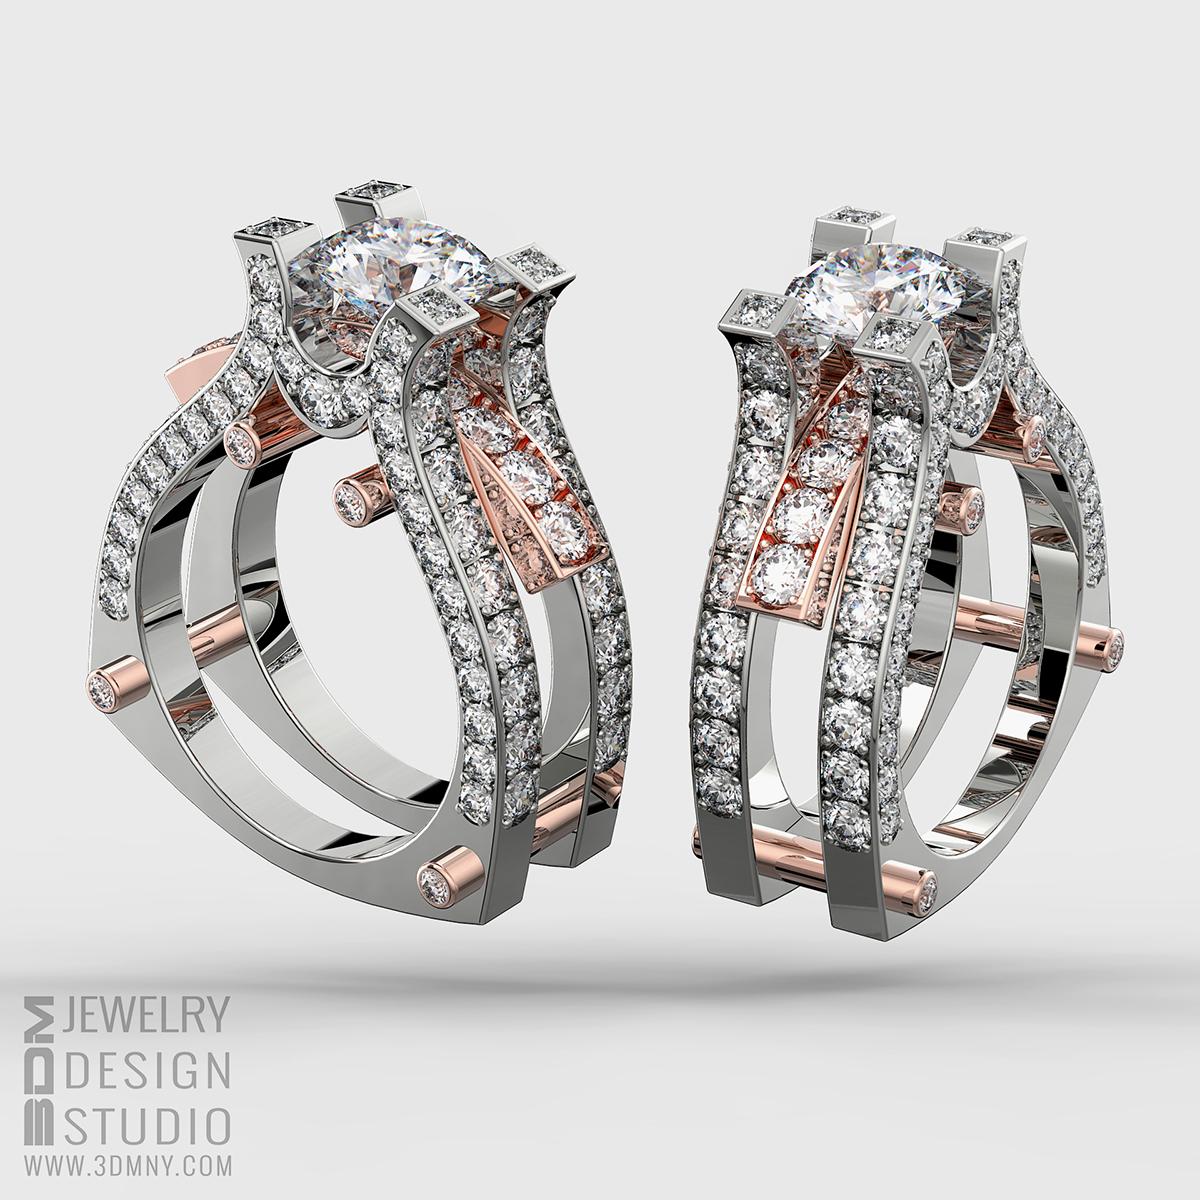 3DM CAD Jewelry Design Studio